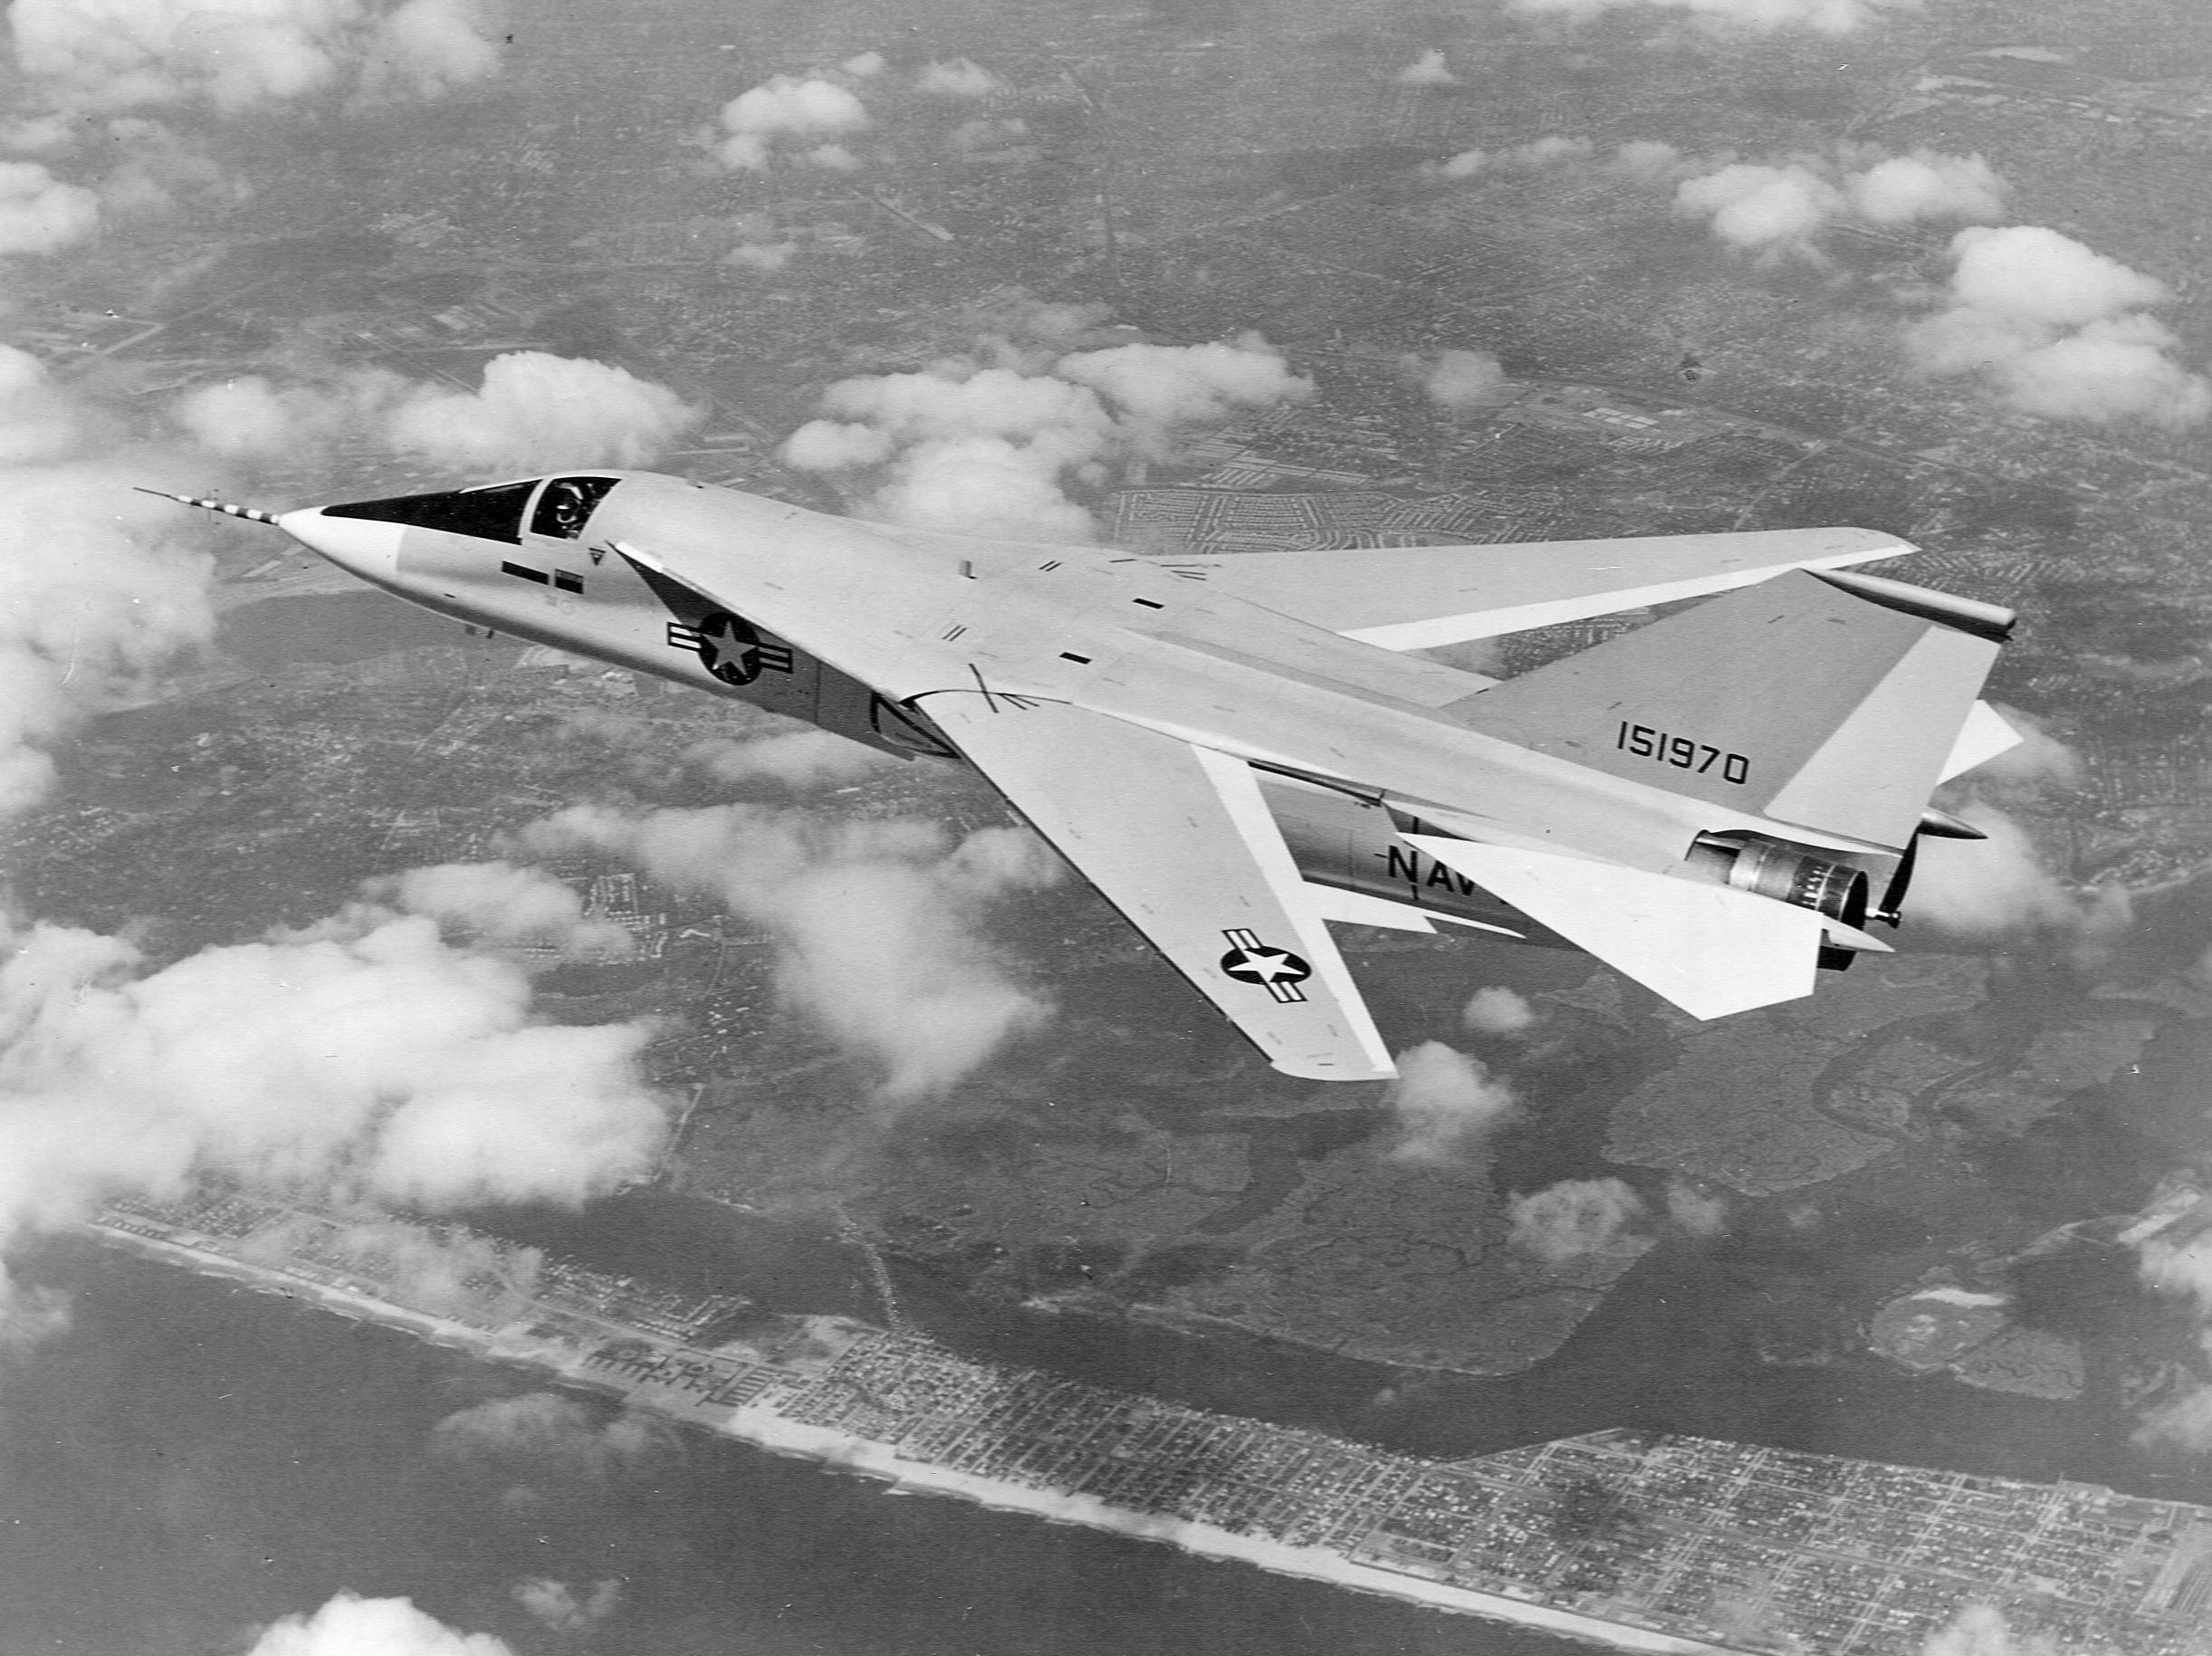 File:F-111B NAN7-65.jpg - Wikipedia, the free encyclopedia